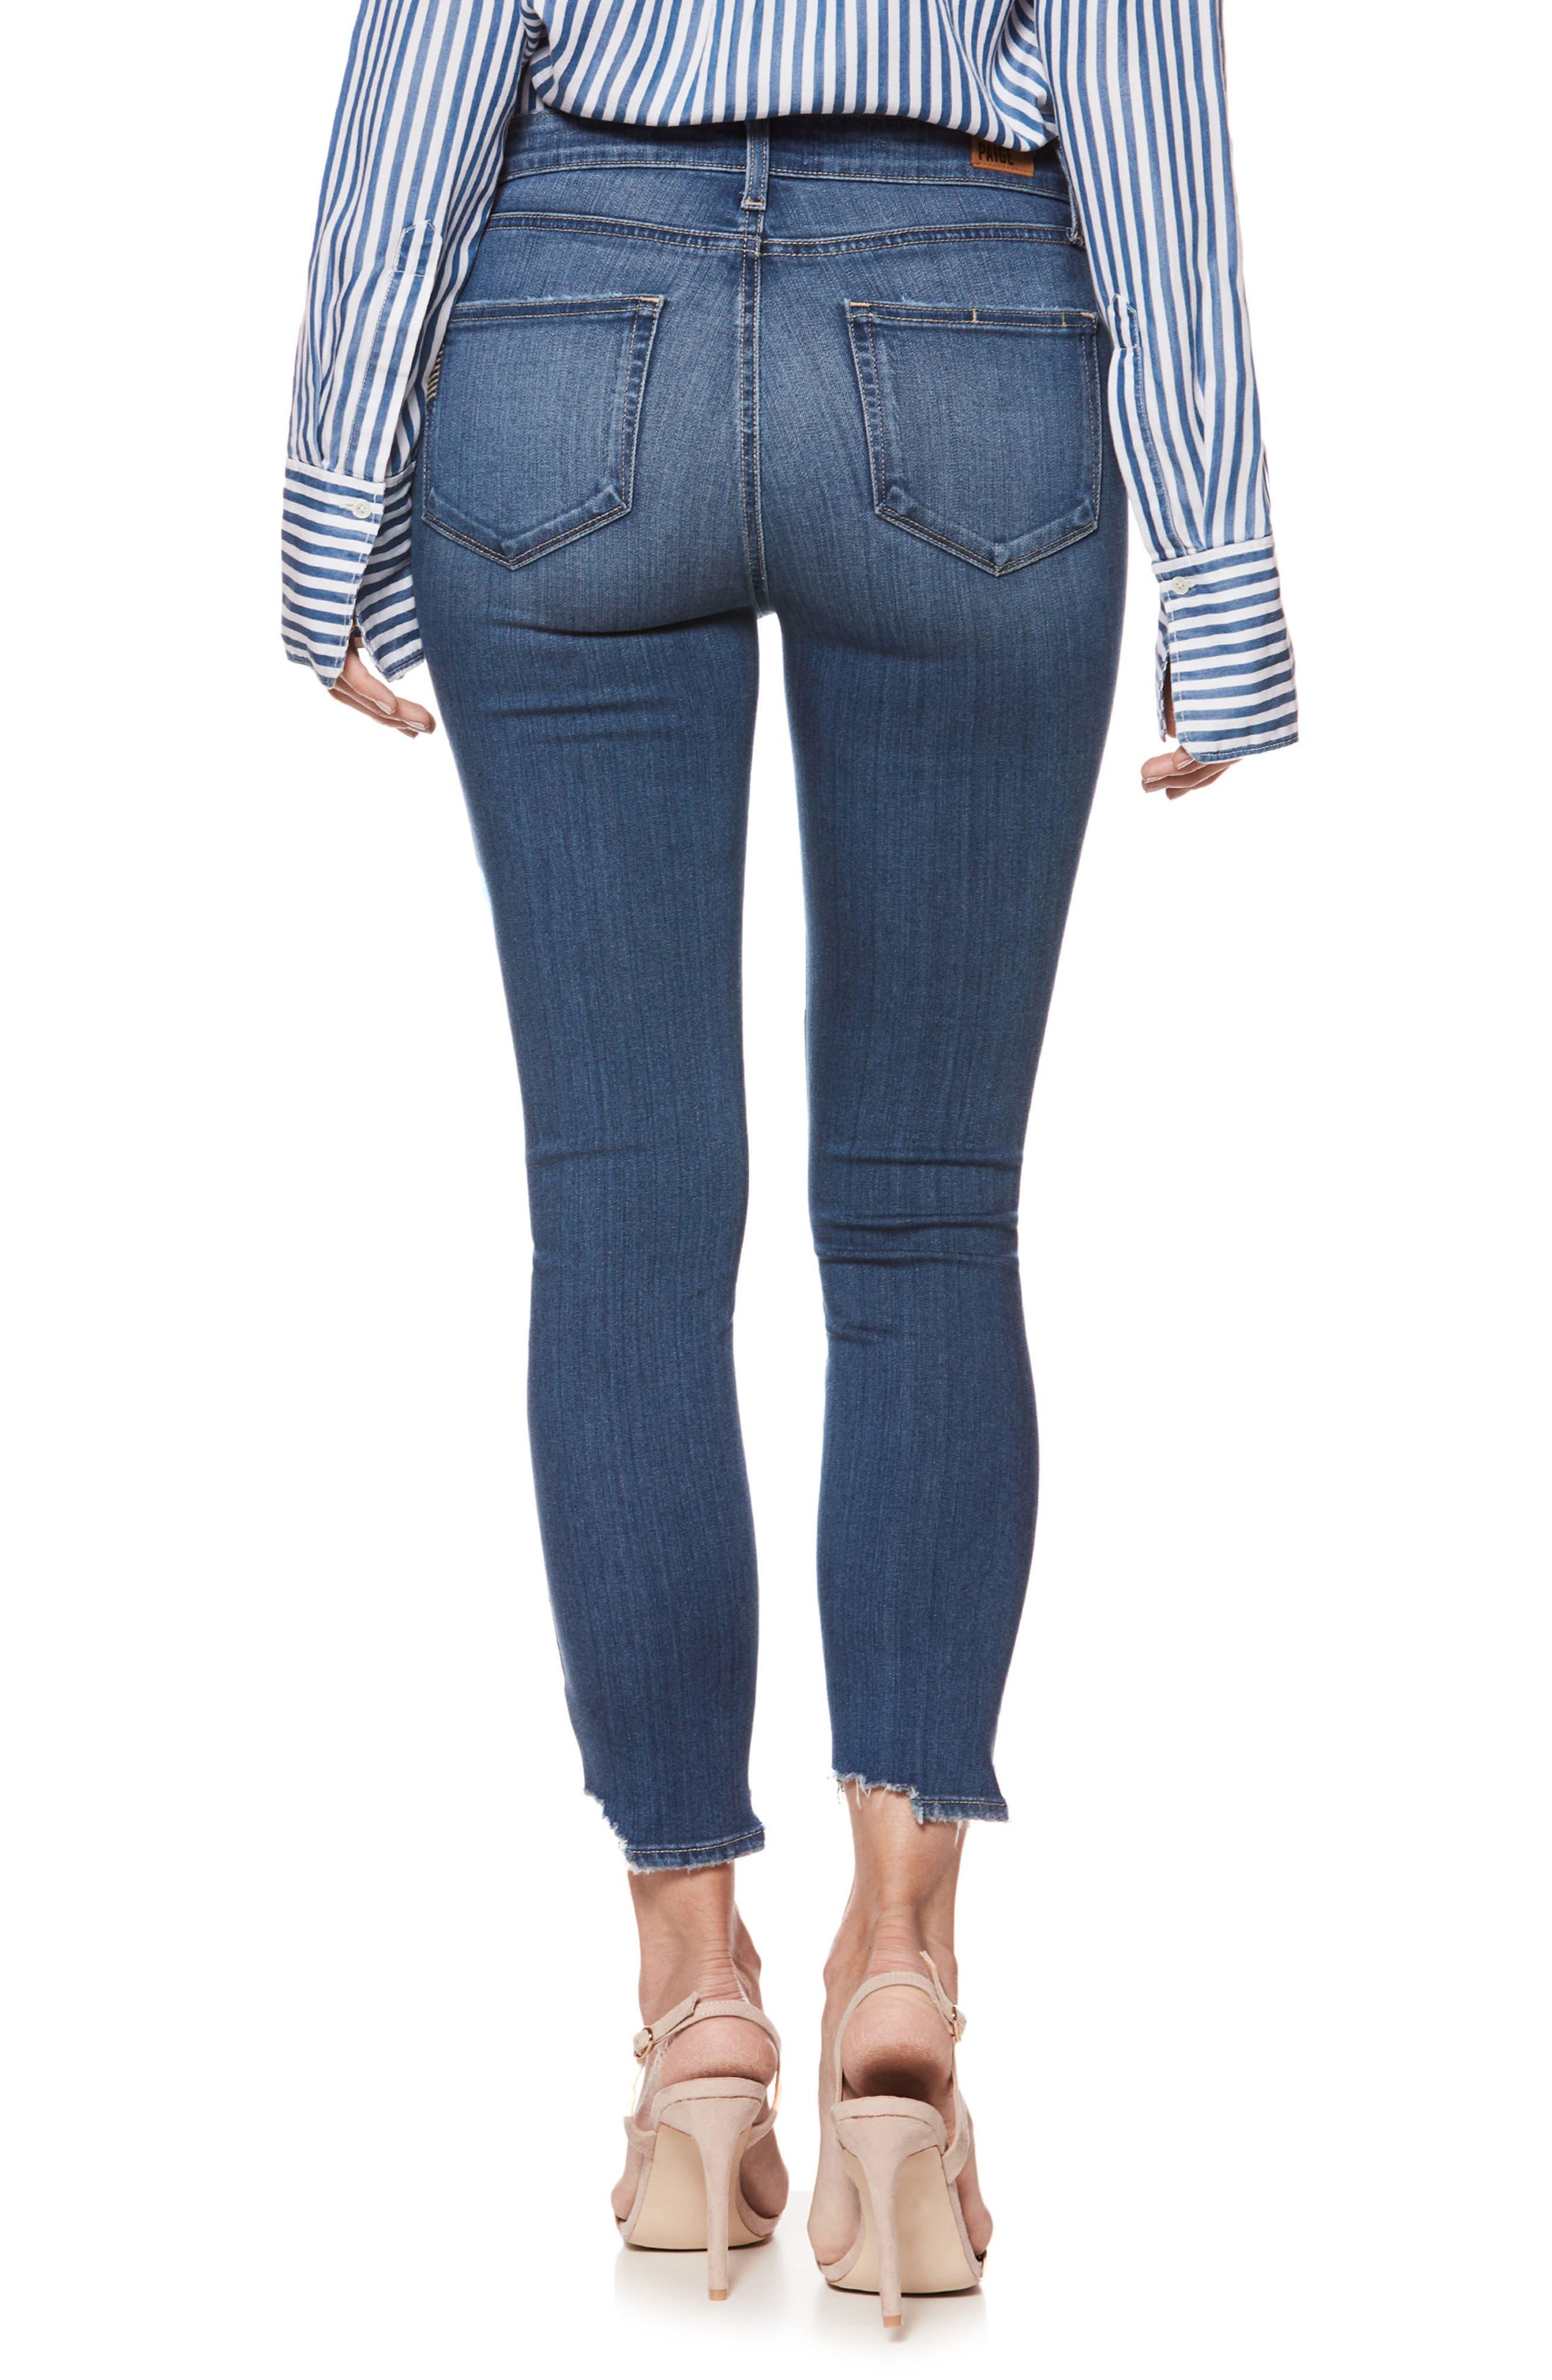 Transcend - Hoxton High Waist Crop Skinny Jeans,                             Alternate thumbnail 2, color,                             400